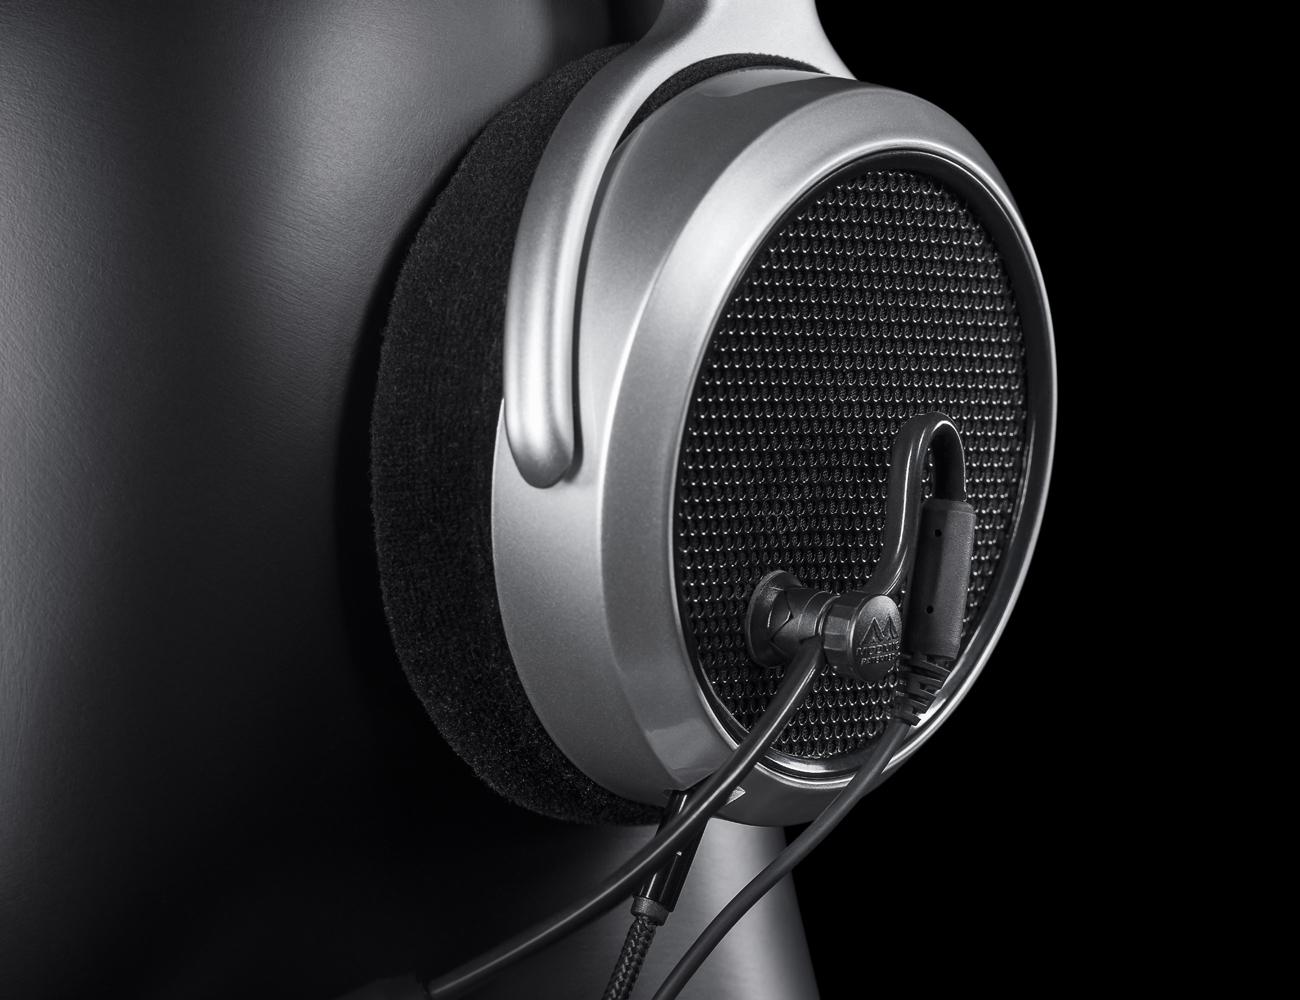 ModMic 5 Modular Microphone